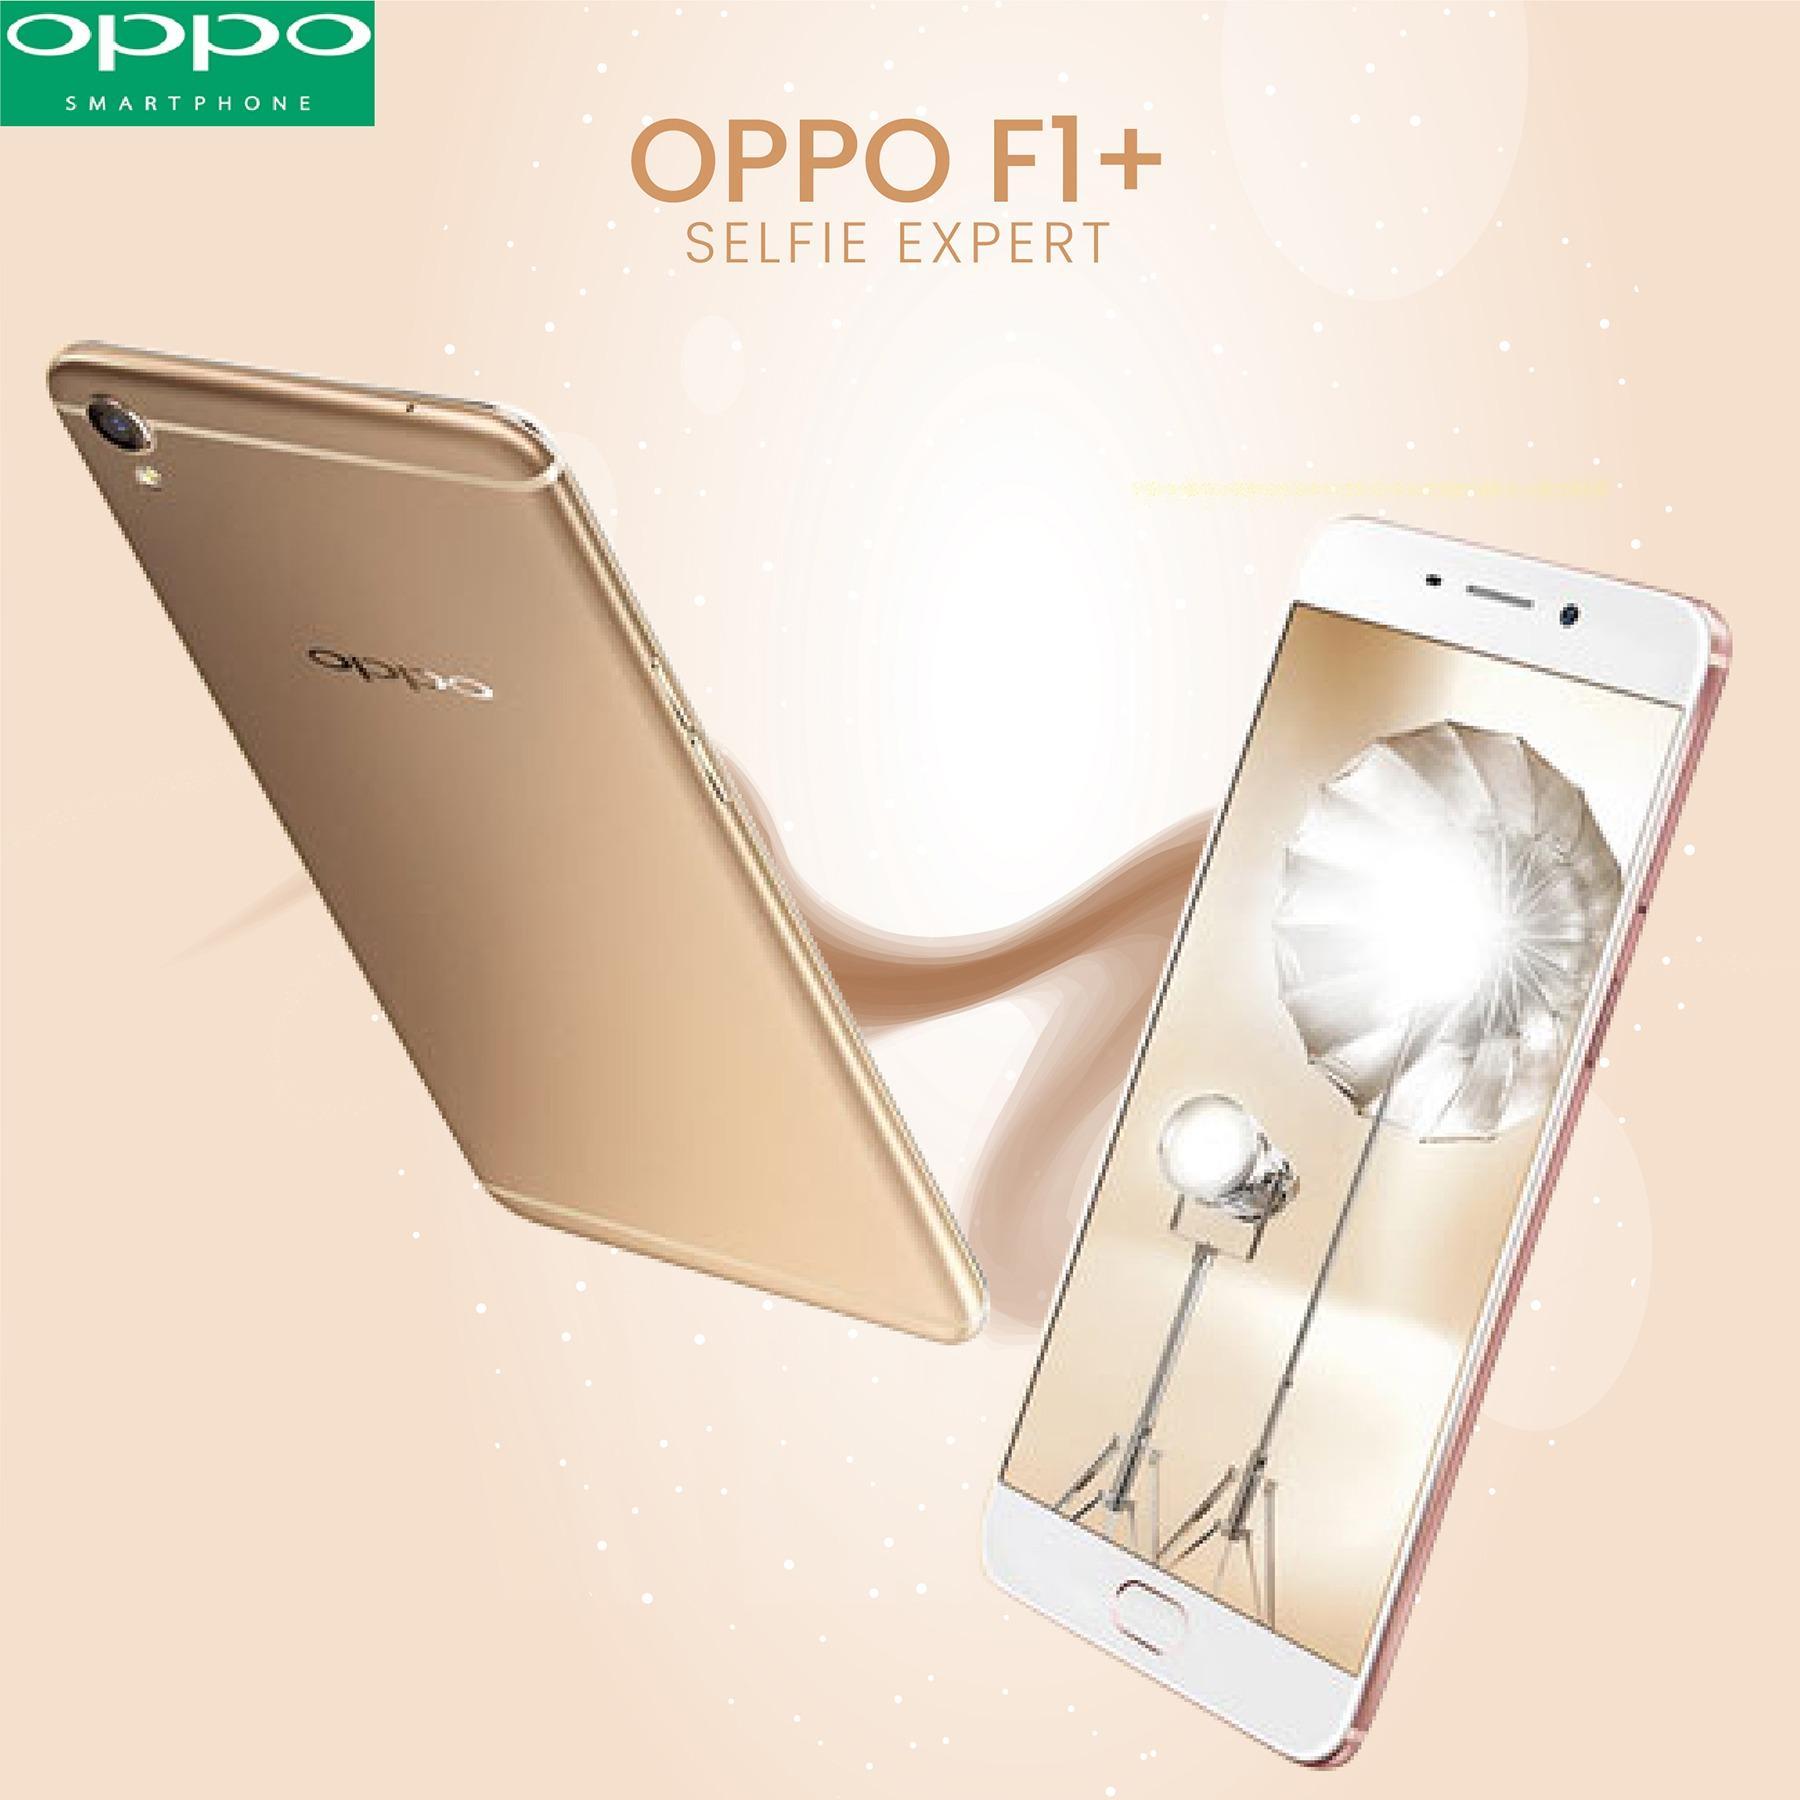 OPPO F1 Plus Selfie Expert 64 GB Ram 4 GB Gold FREE VR BOX DISKON 23%